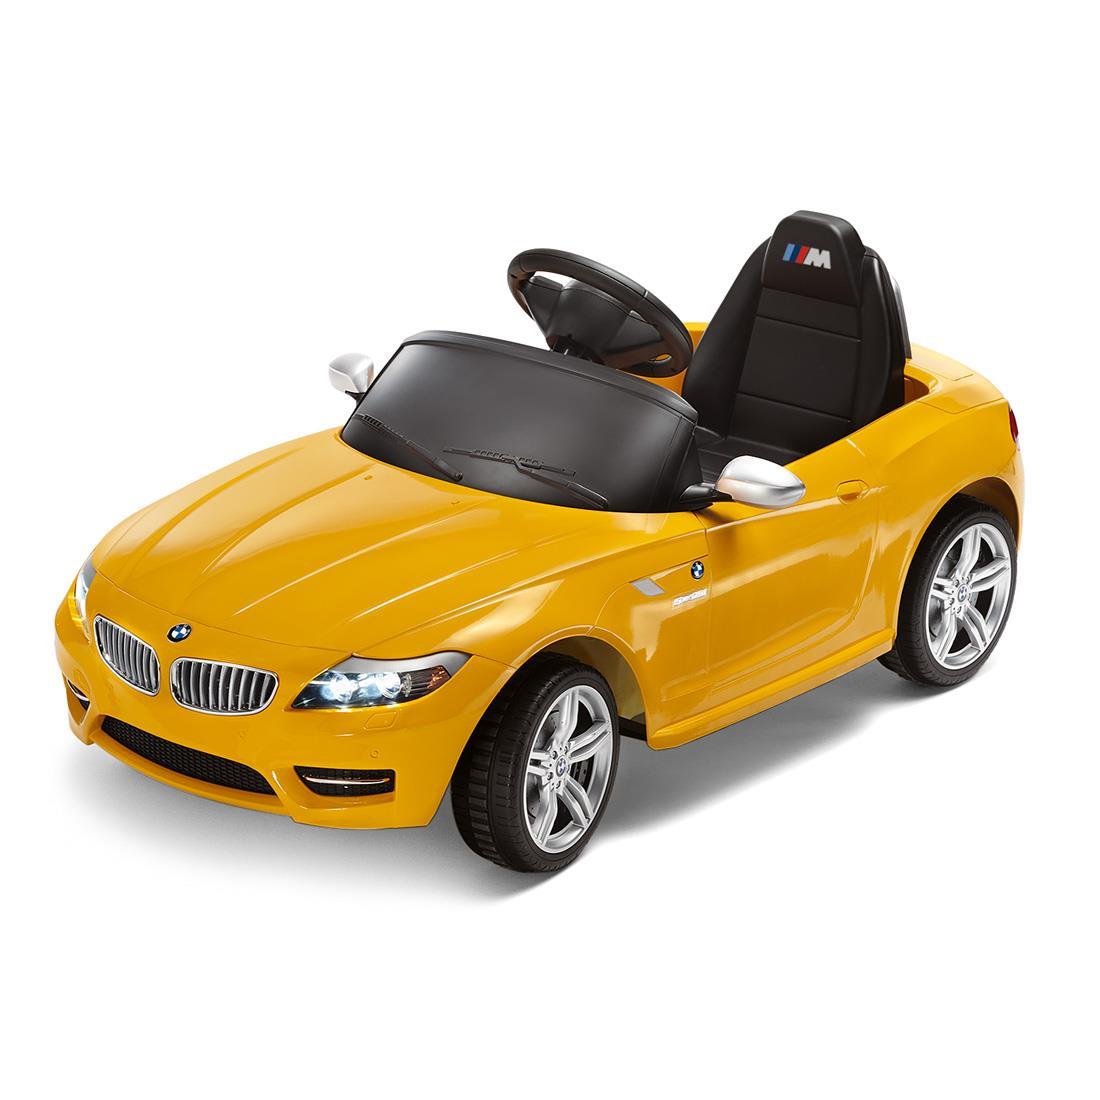 Bmw Z4 Yellow For Sale Bmw Z4 Yellow For Sale 2018 Bmw Z4